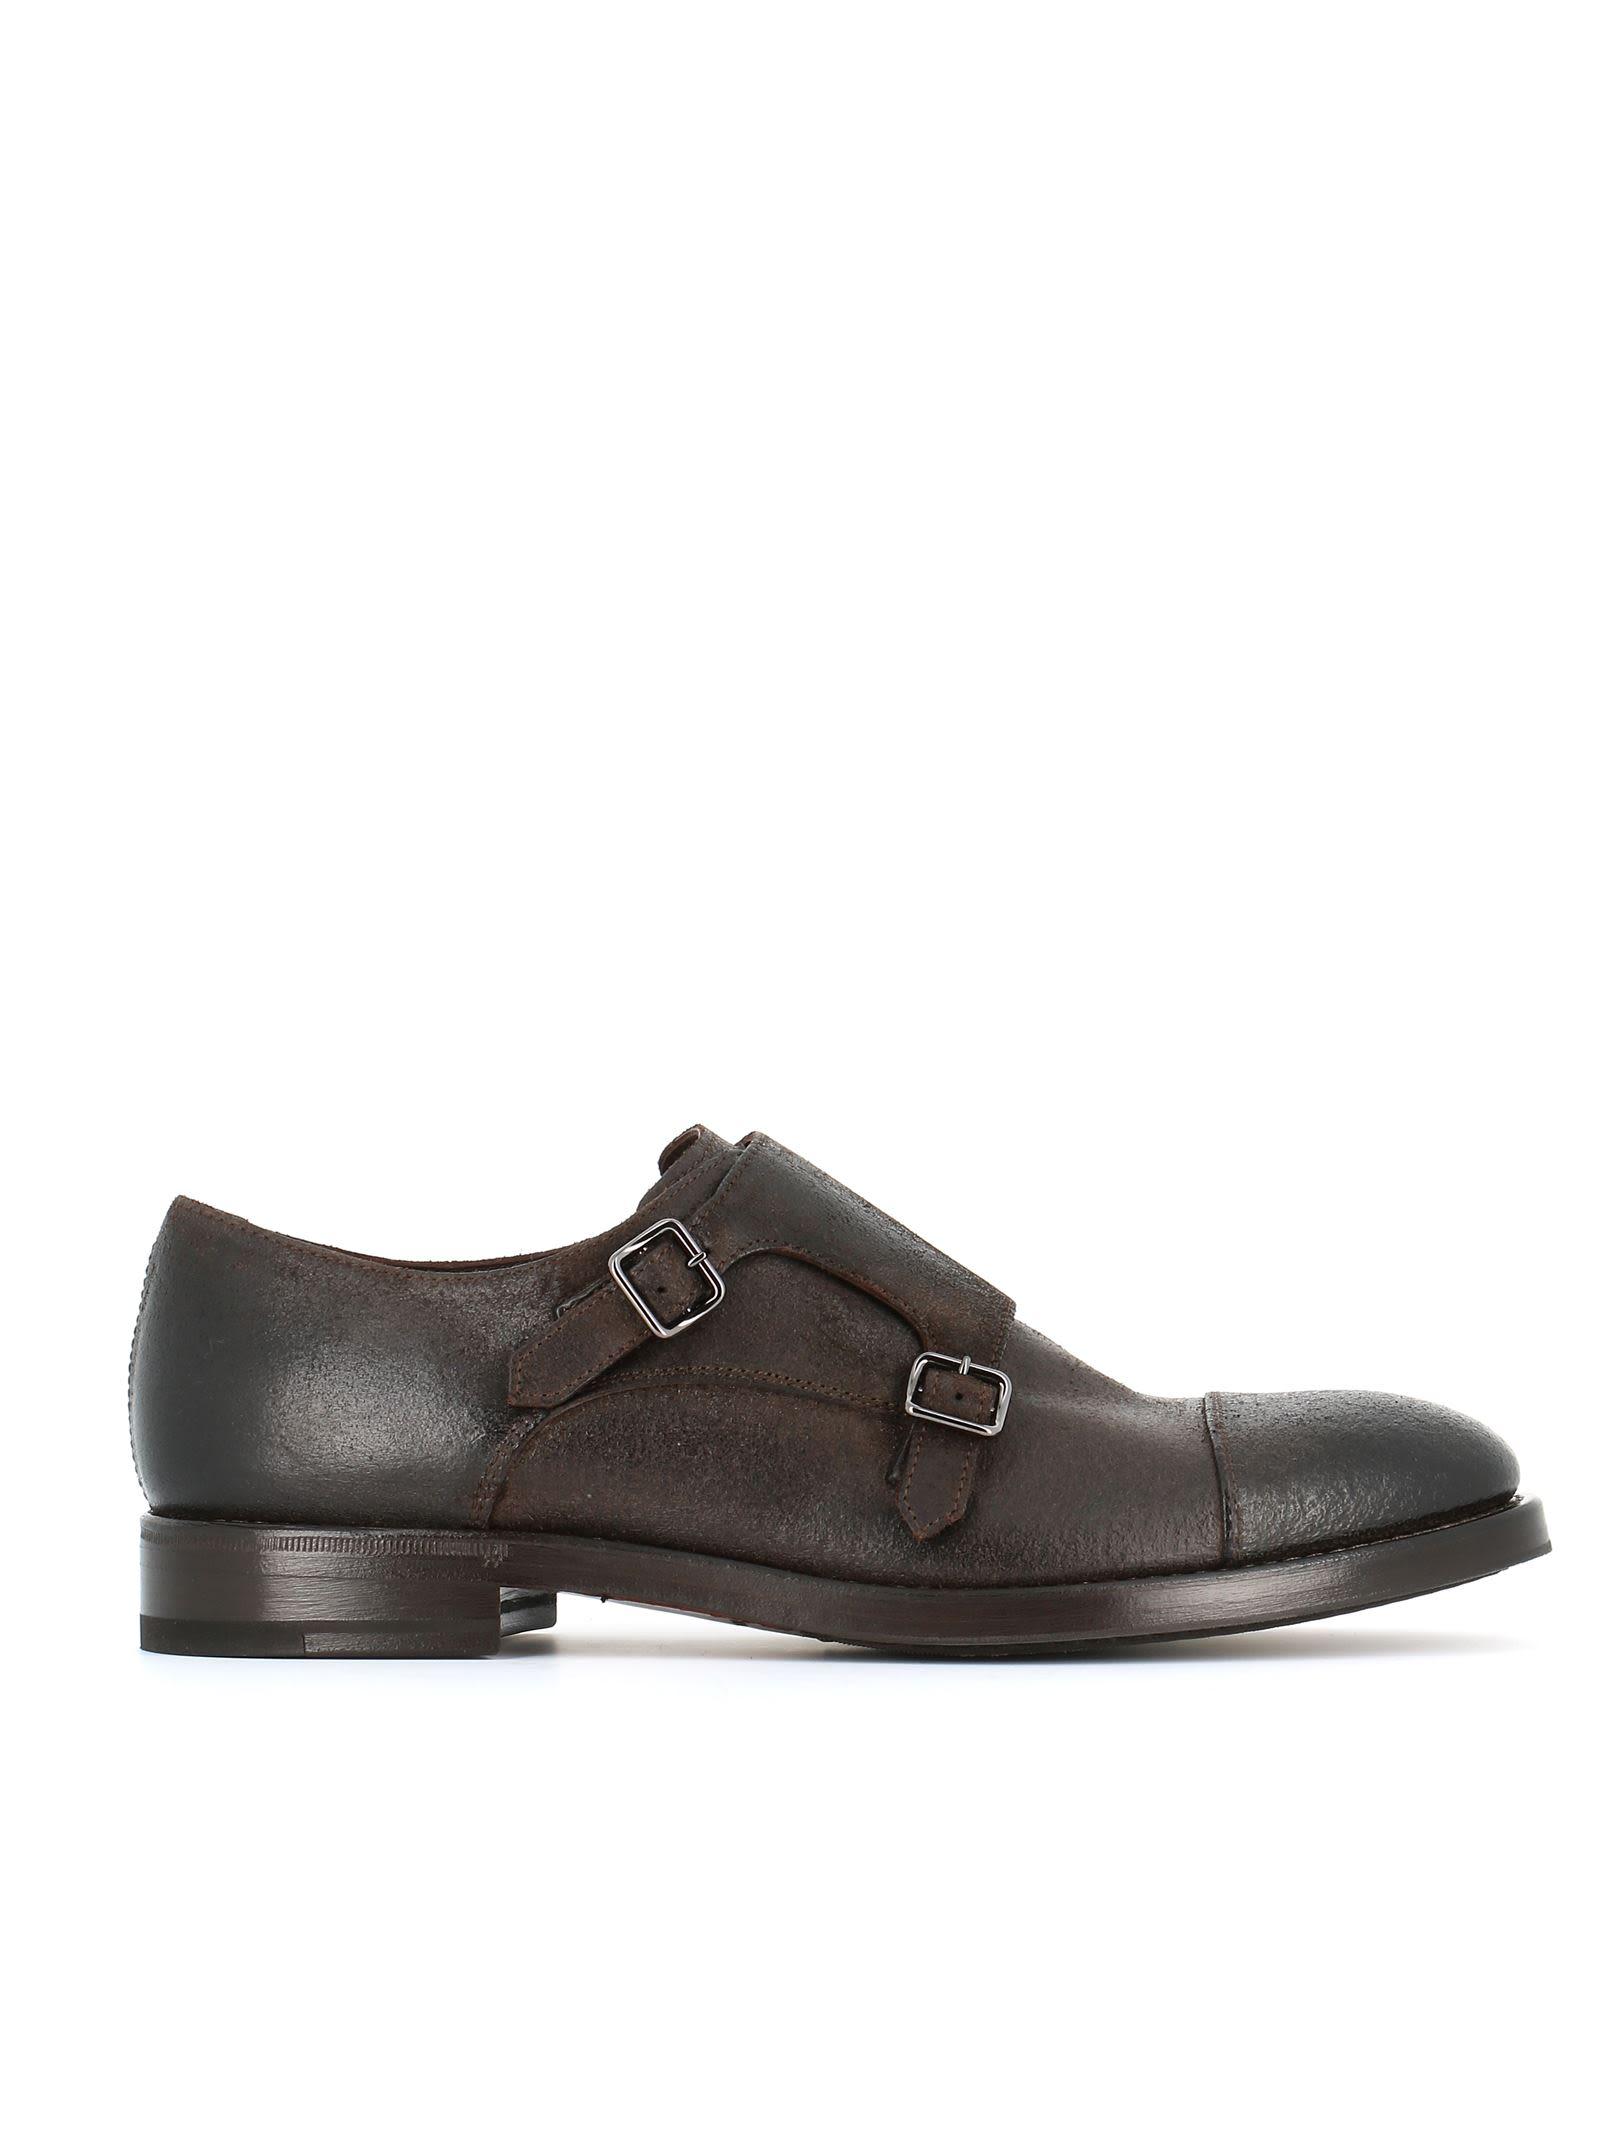 Henderson Buckled Shoe